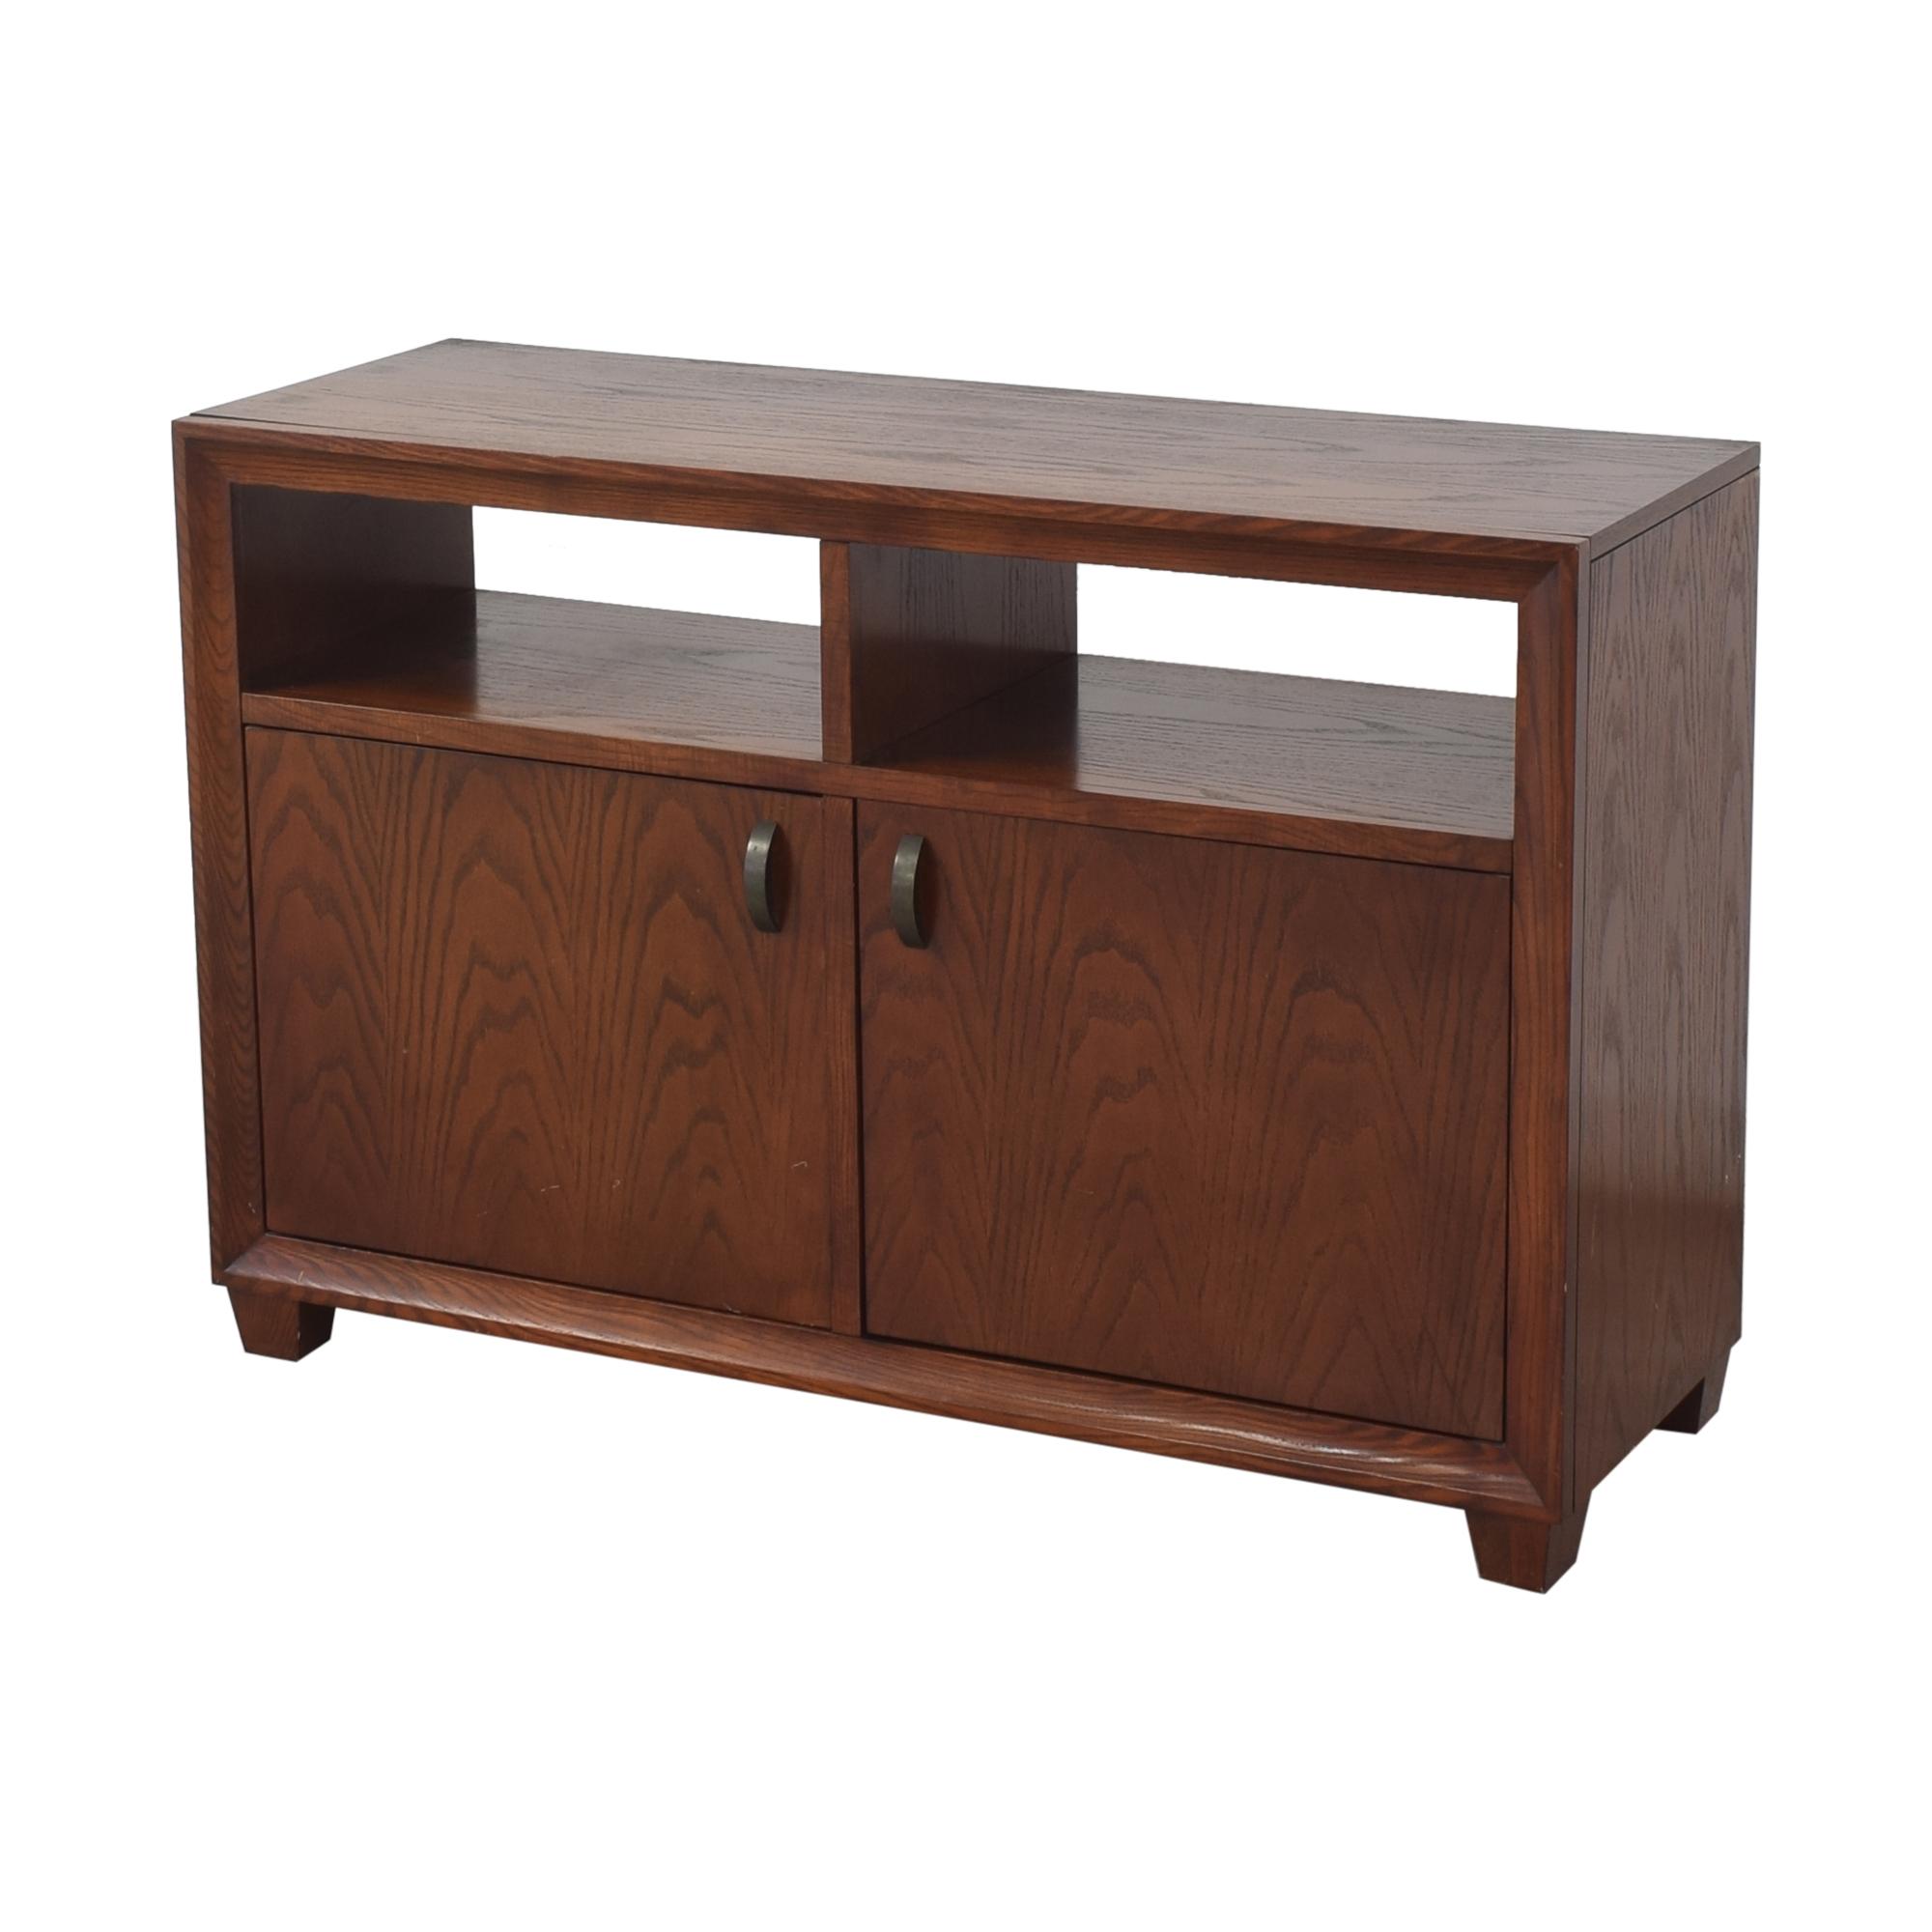 shop Crate & Barrel Two Door Sideboard Crate & Barrel Cabinets & Sideboards